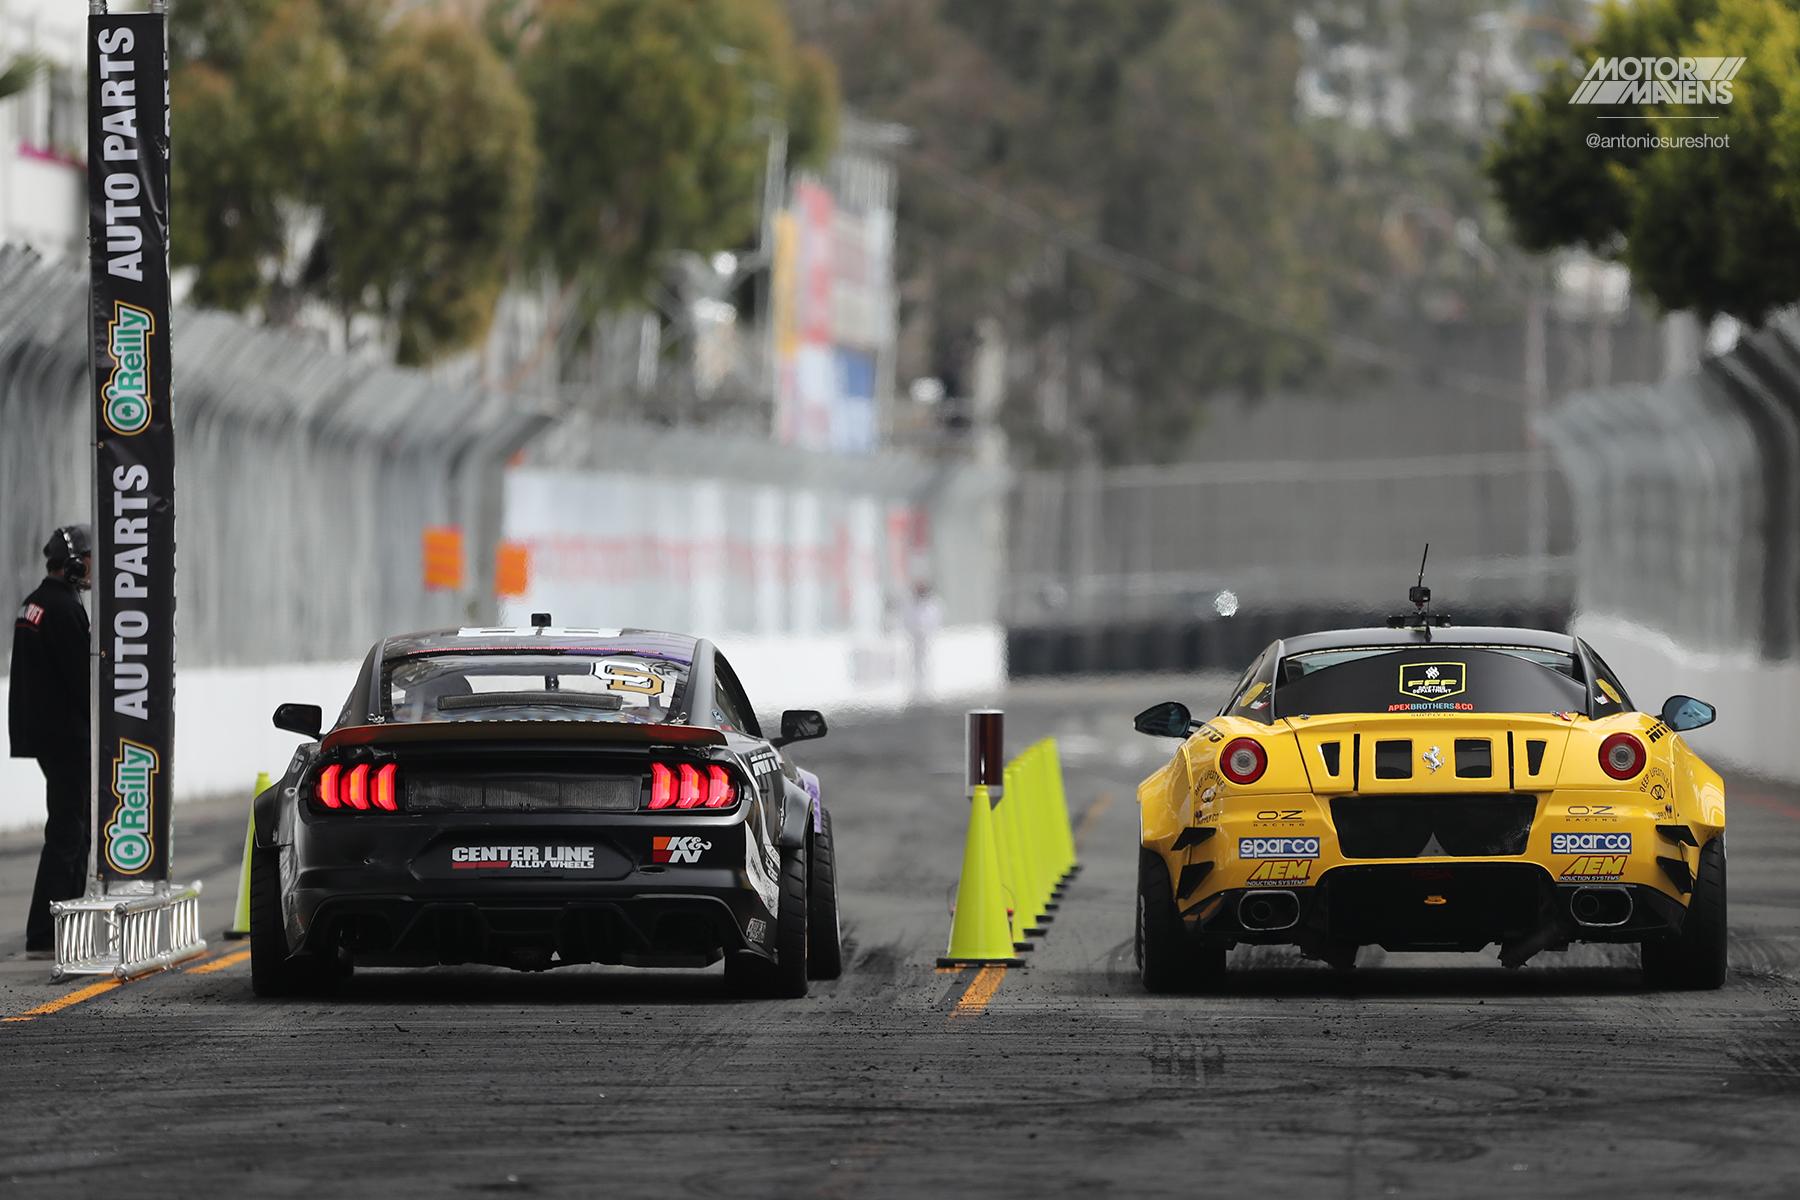 Federico Sceriffo, Ferrari 599, Formula Drift, Chelsea Denofa, Mustang RTR